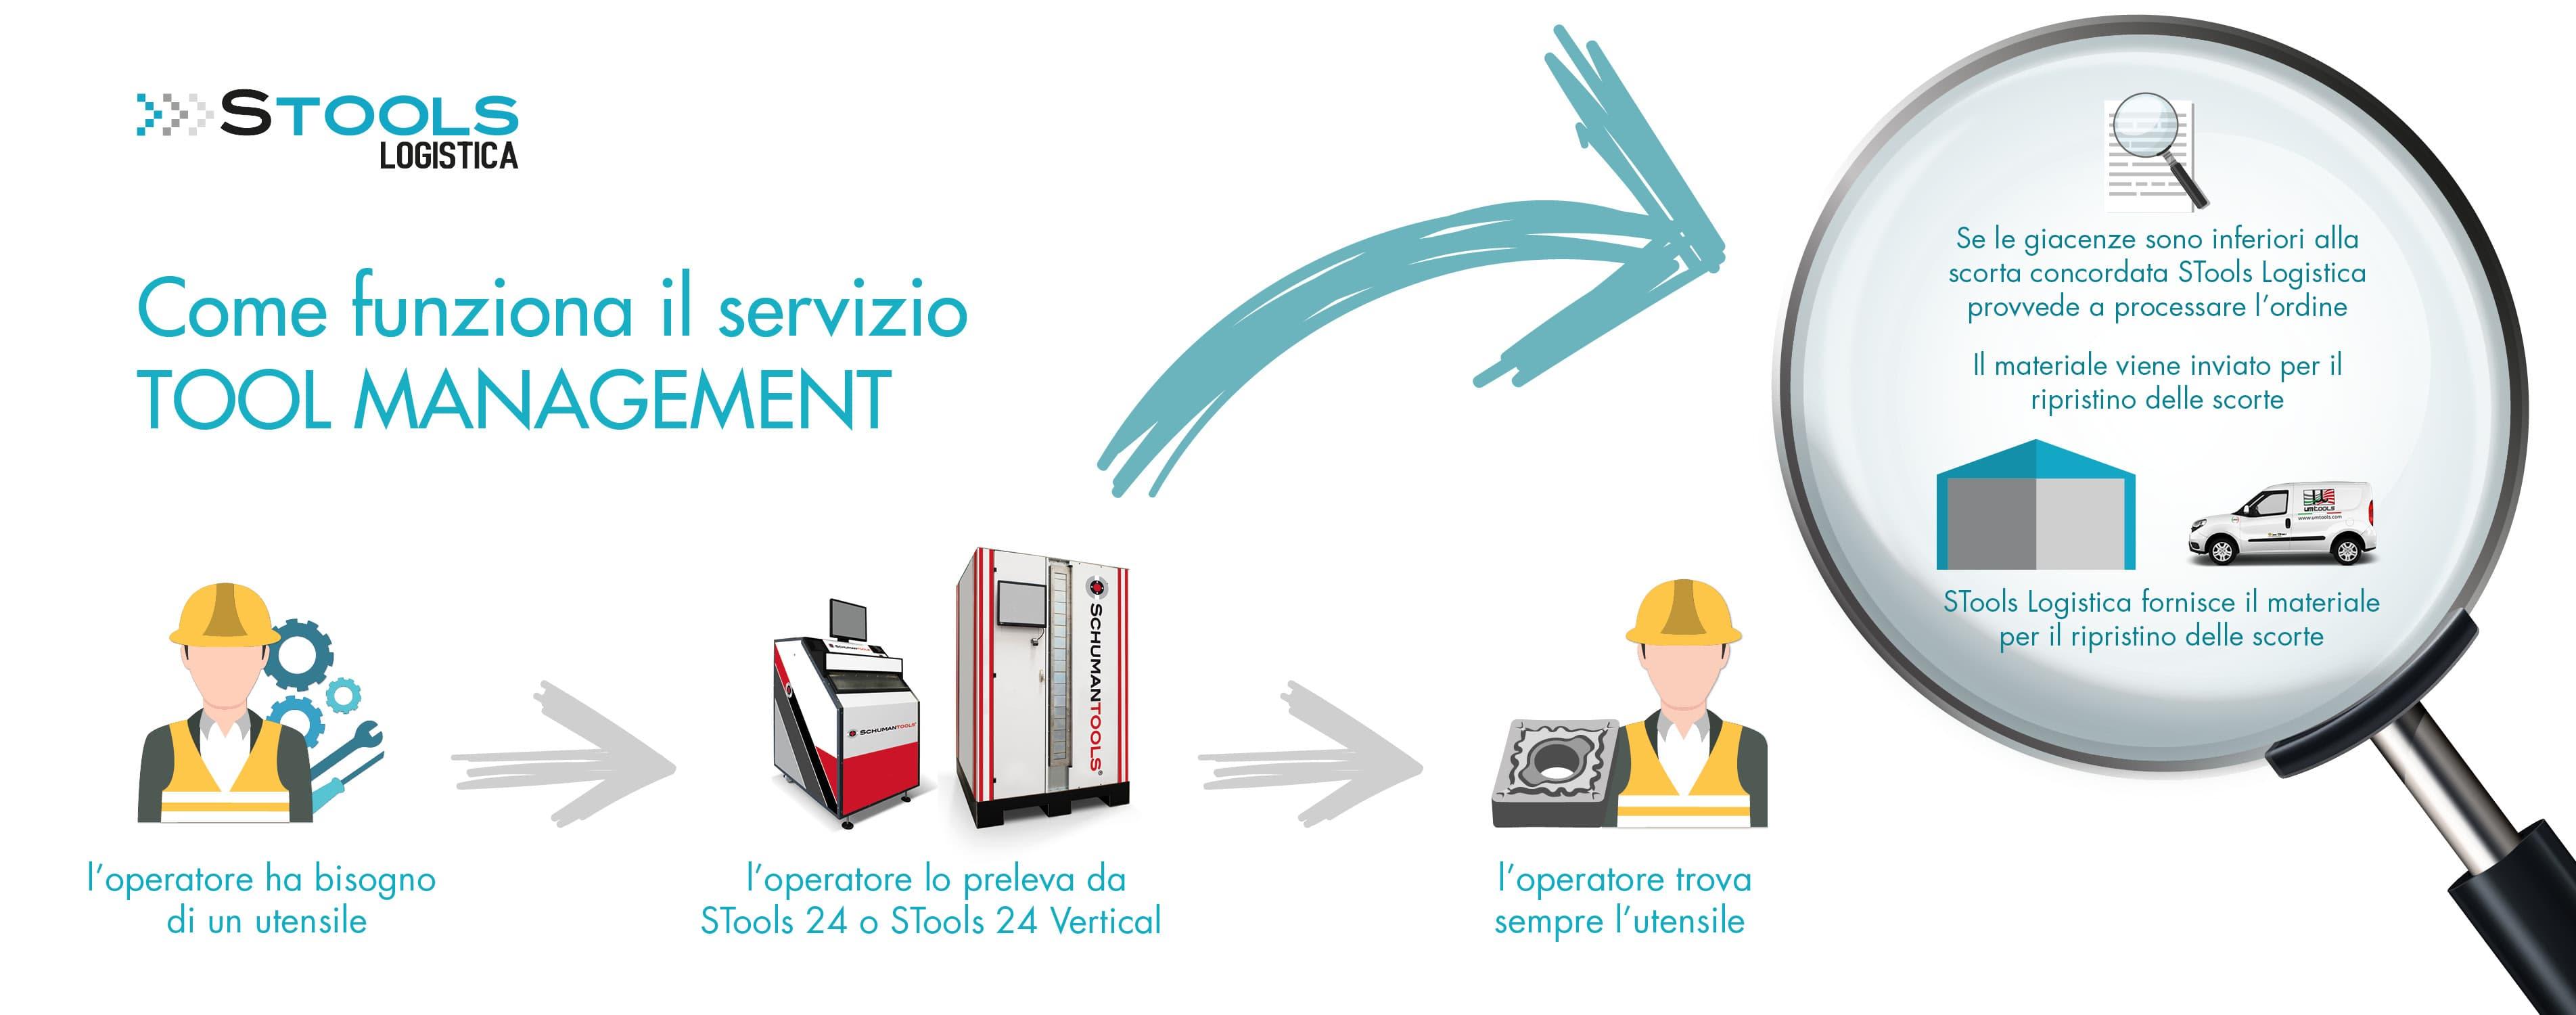 Schema cassettiere smart stools logistica um tools-min